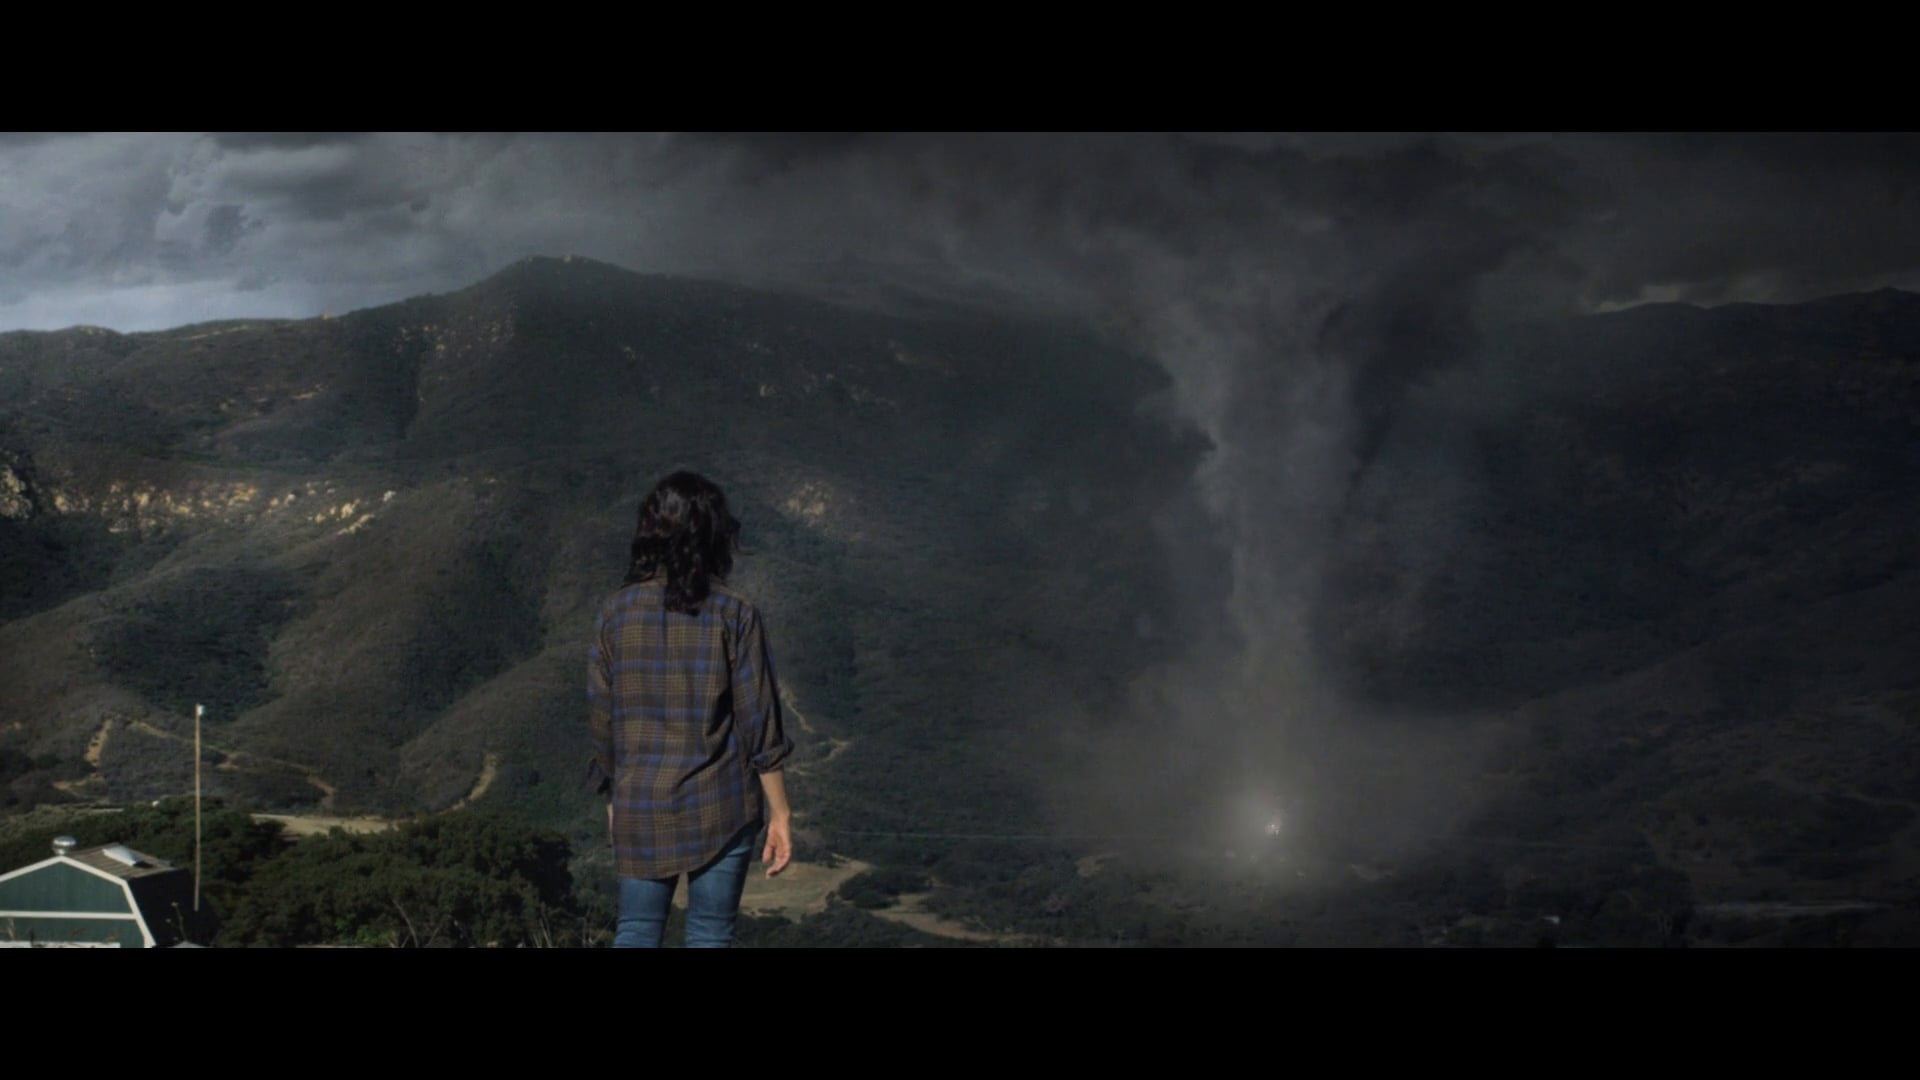 The Mother Warns of the Tornado   Poem by Catherine Pierce   Film by Isaac Ravishanara